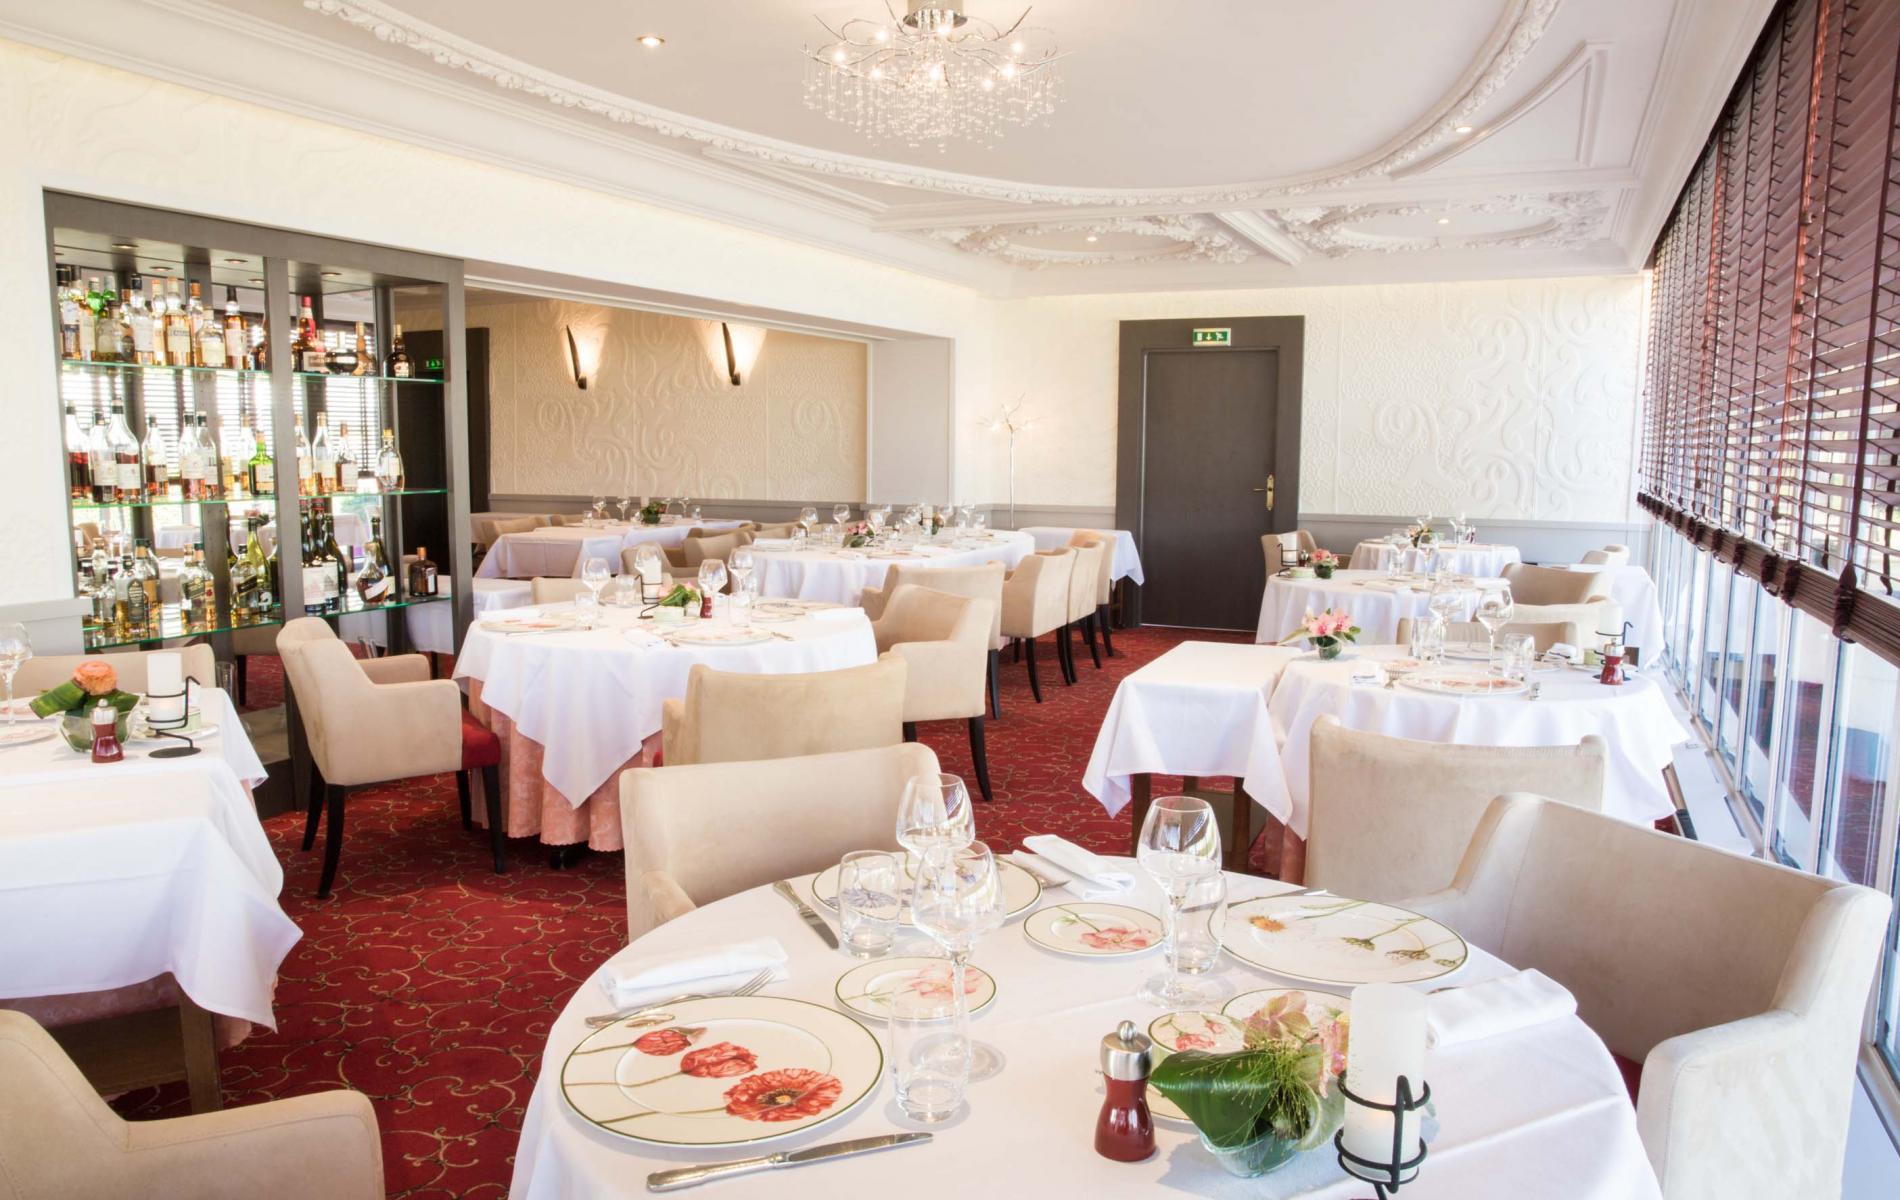 Town center Blois Hotel